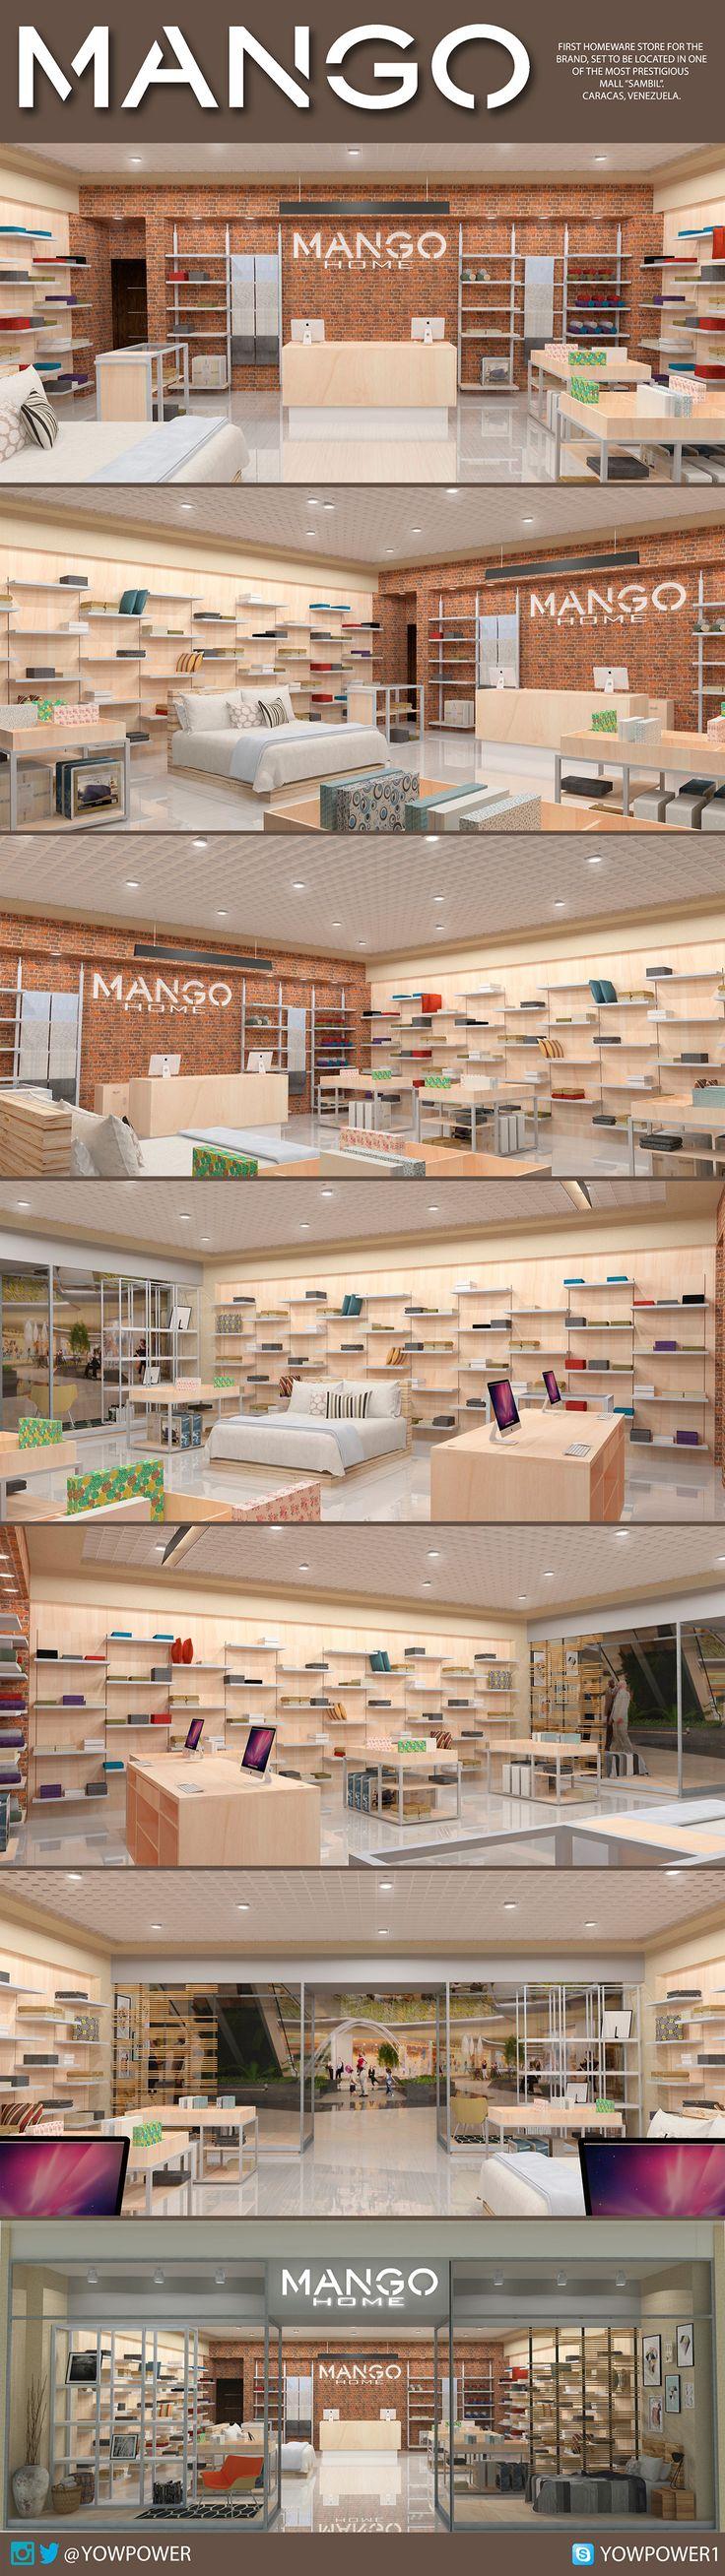 best 10 mango store locator ideas on pinterest reading manga